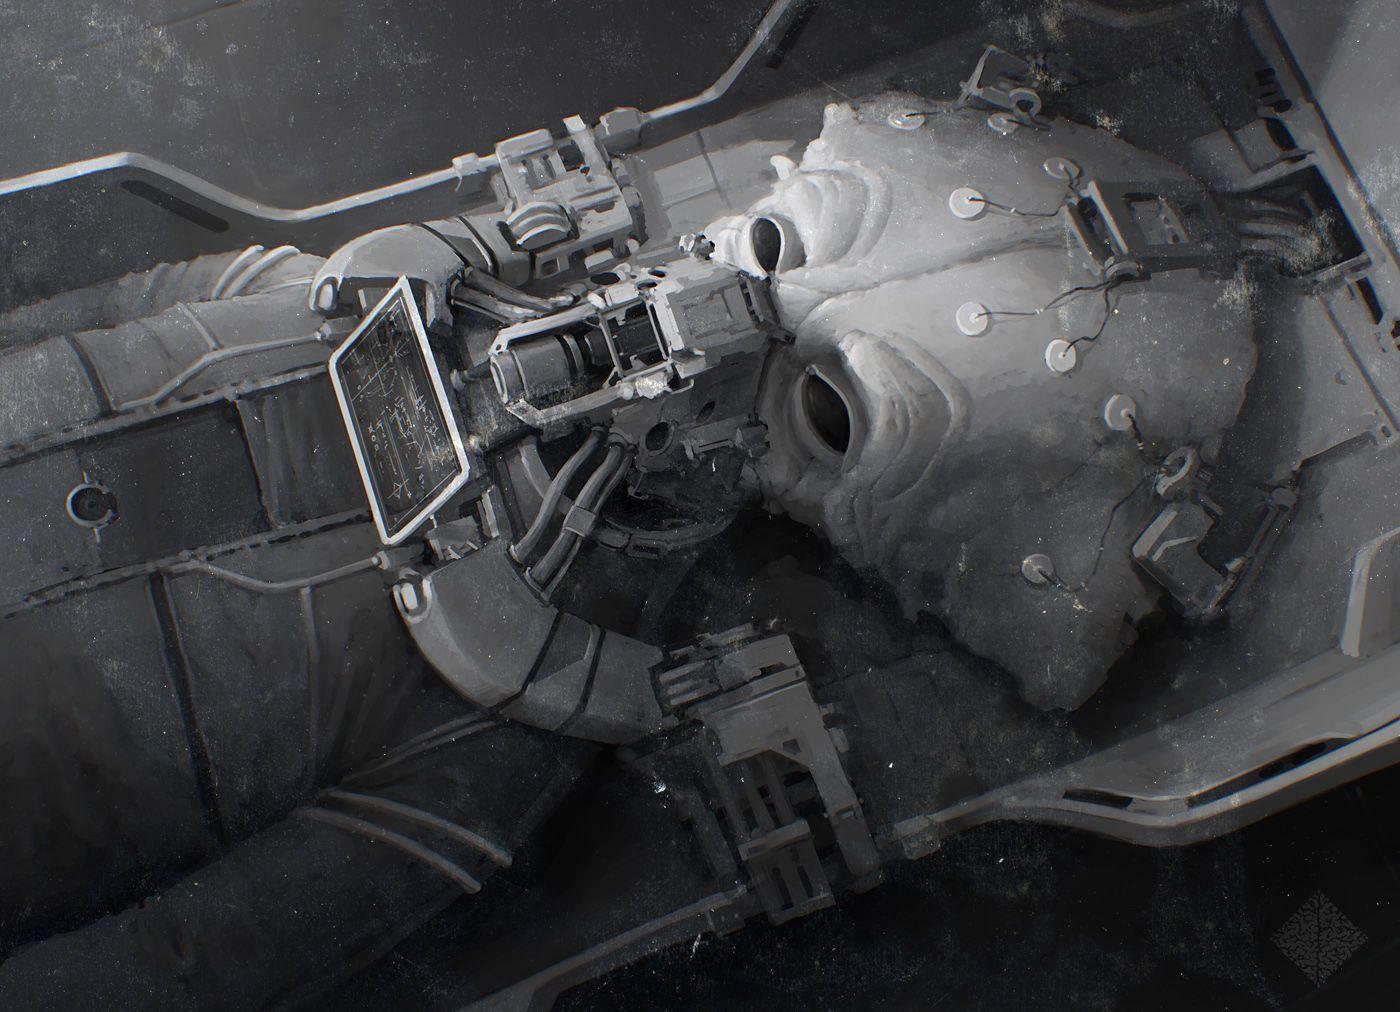 Vadim Shchepilov - Alien